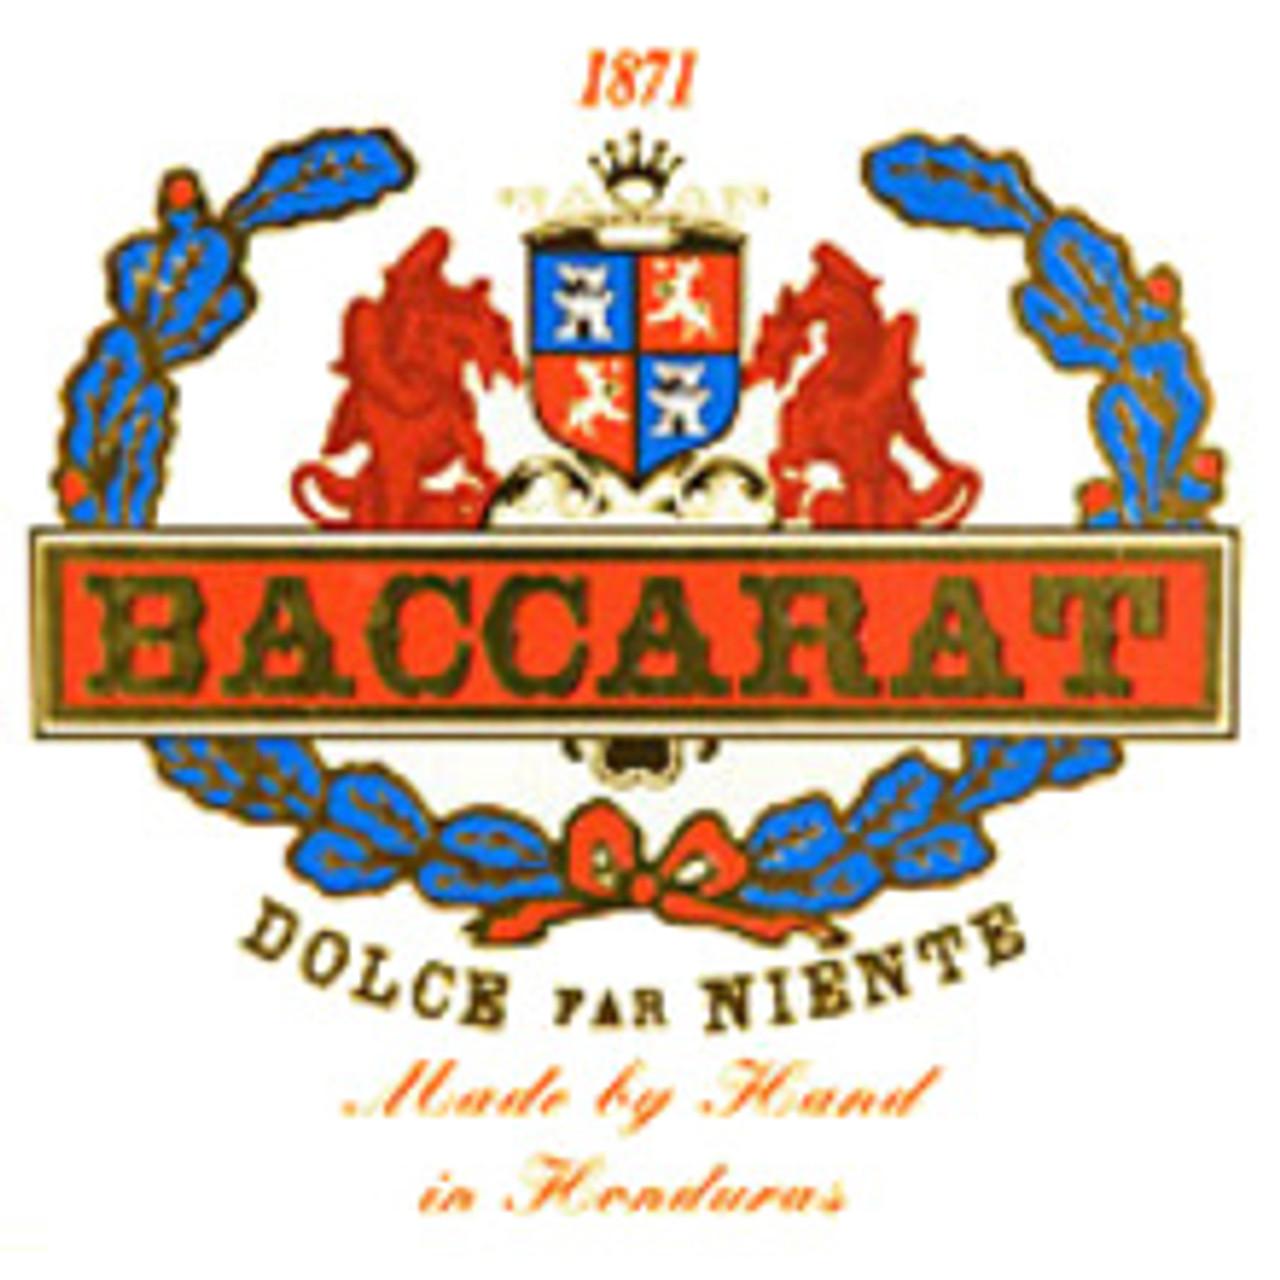 Baccarat Rothschild Maduro Cigars - 5 x 50 (Box of 25)